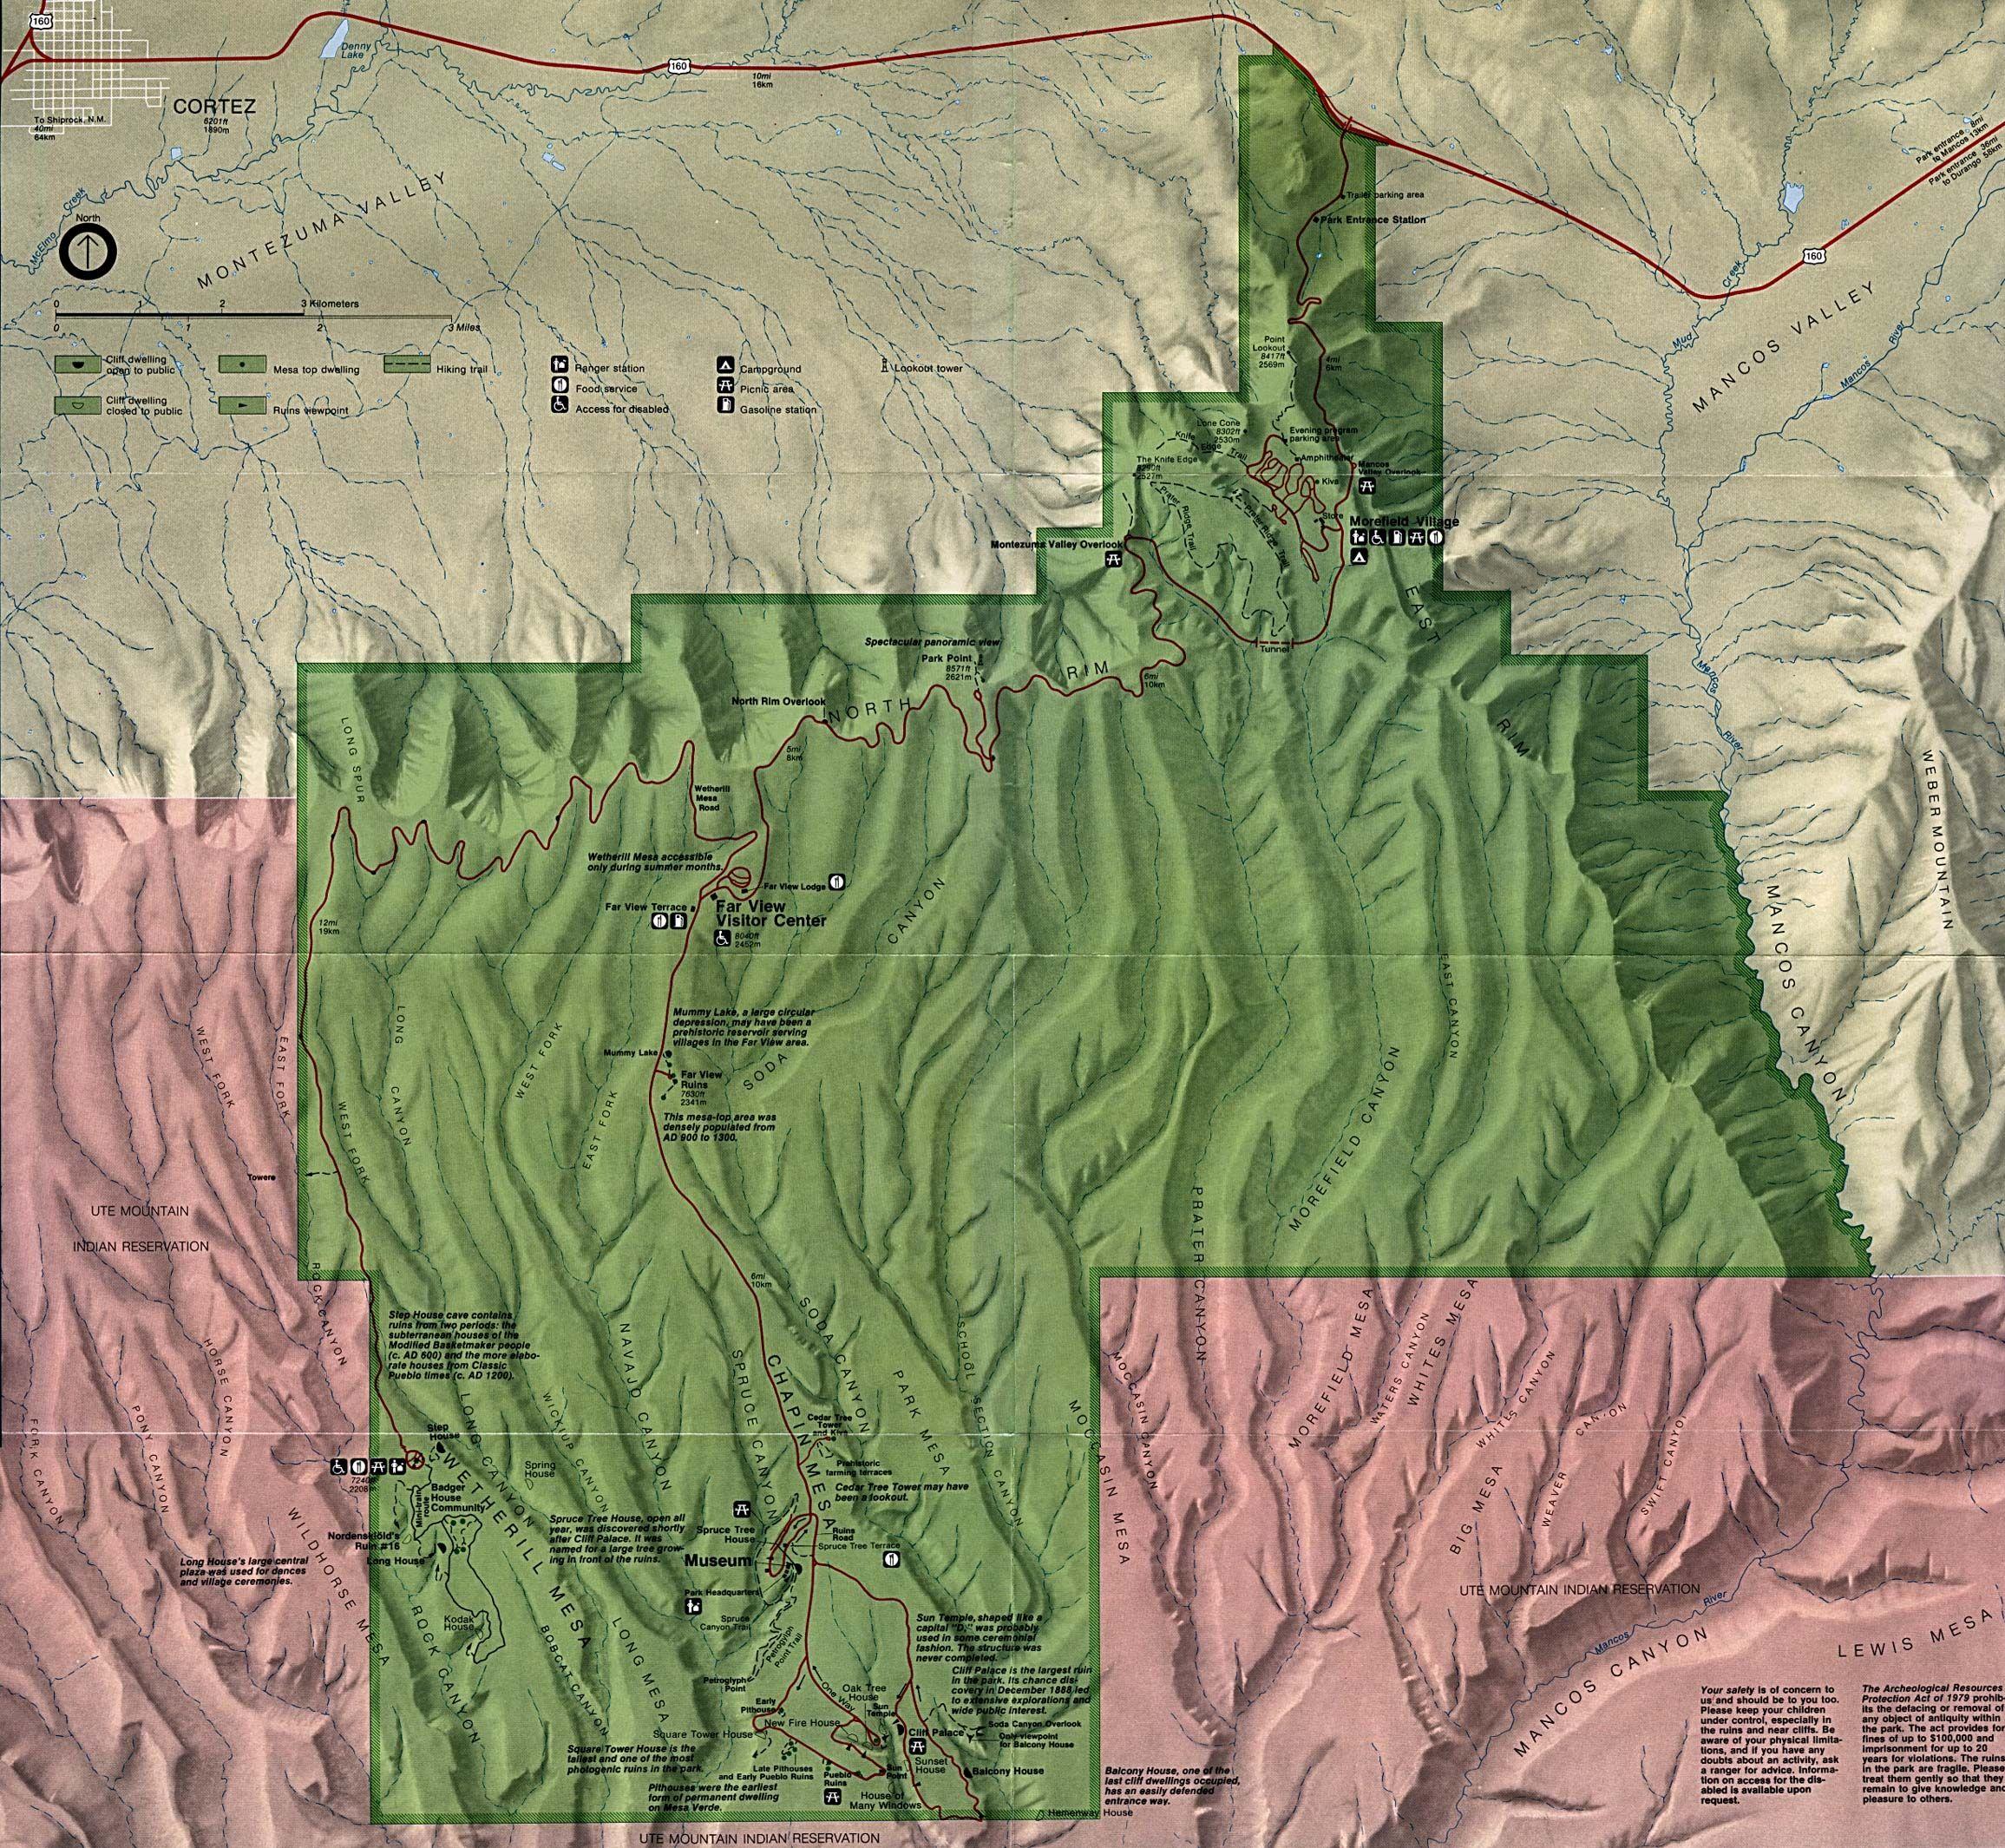 Mesa Verde National Park map | cartography & visualization ...